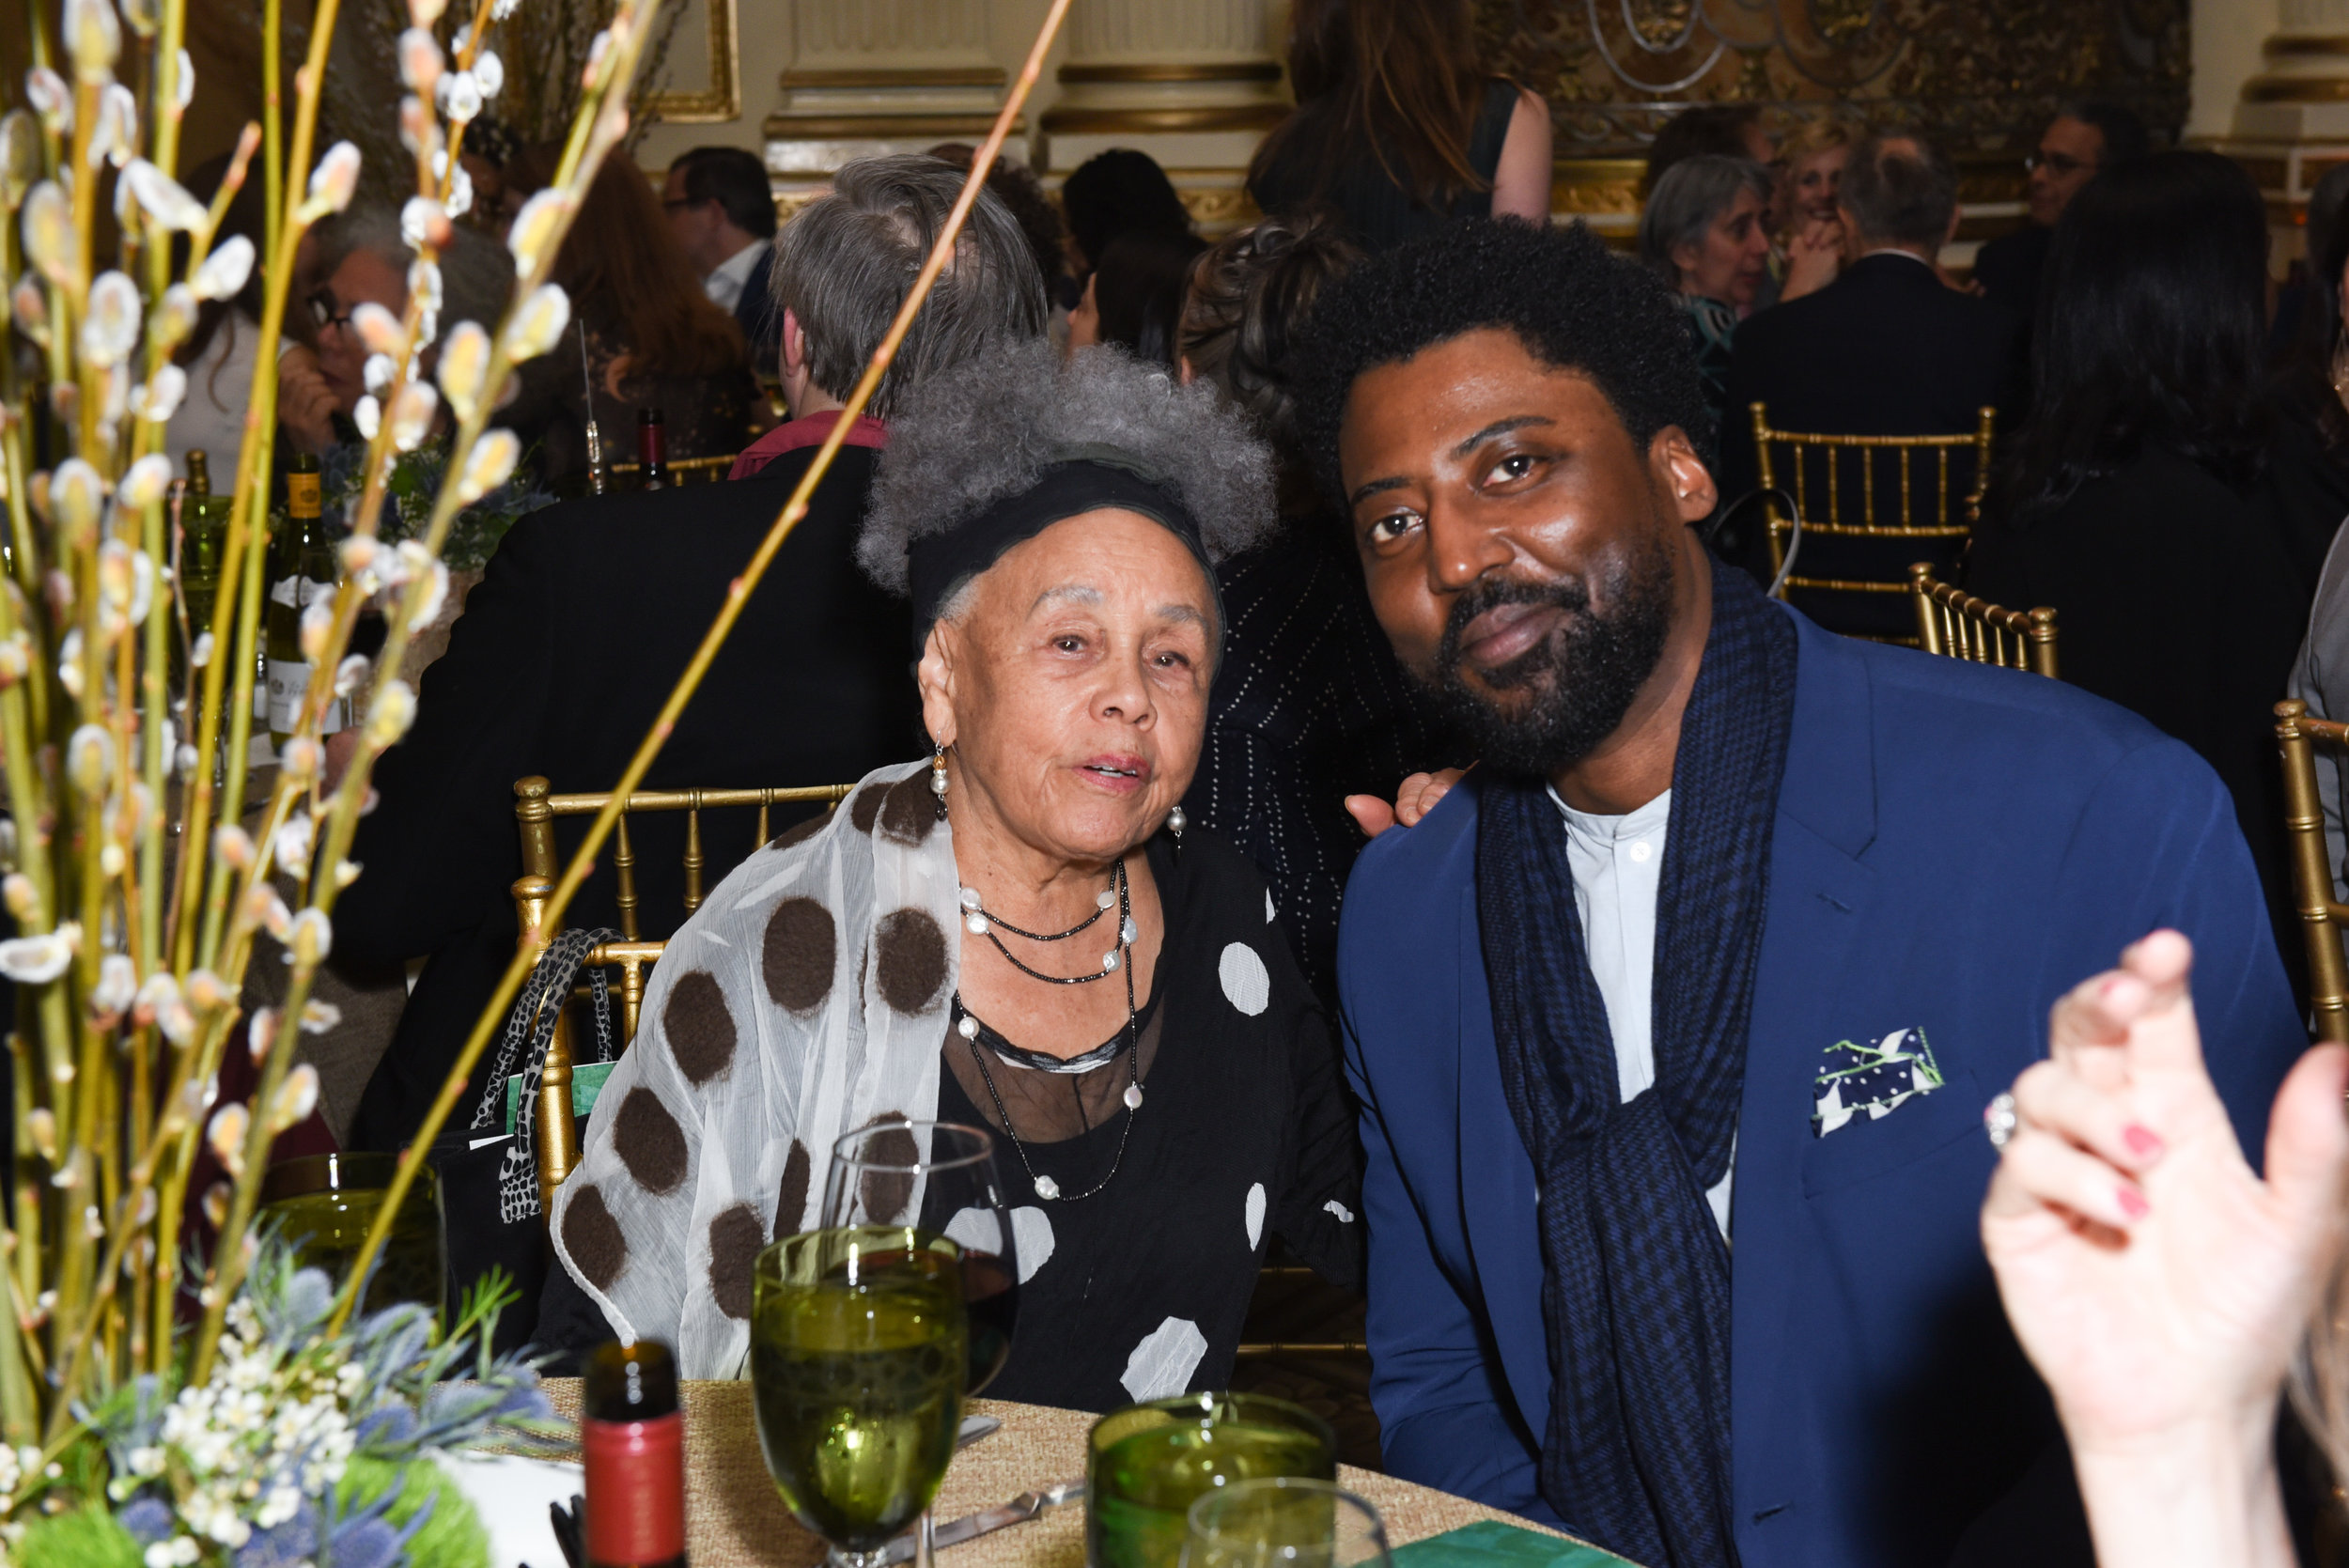 Betye Saar, LeRonn Brooks==Skowhegan Awards Dinner 2018==The Plaza Hotel, New York, NY==April 24, 2018==�Patrick McMullan==Photo - Presley Ann/PMC====